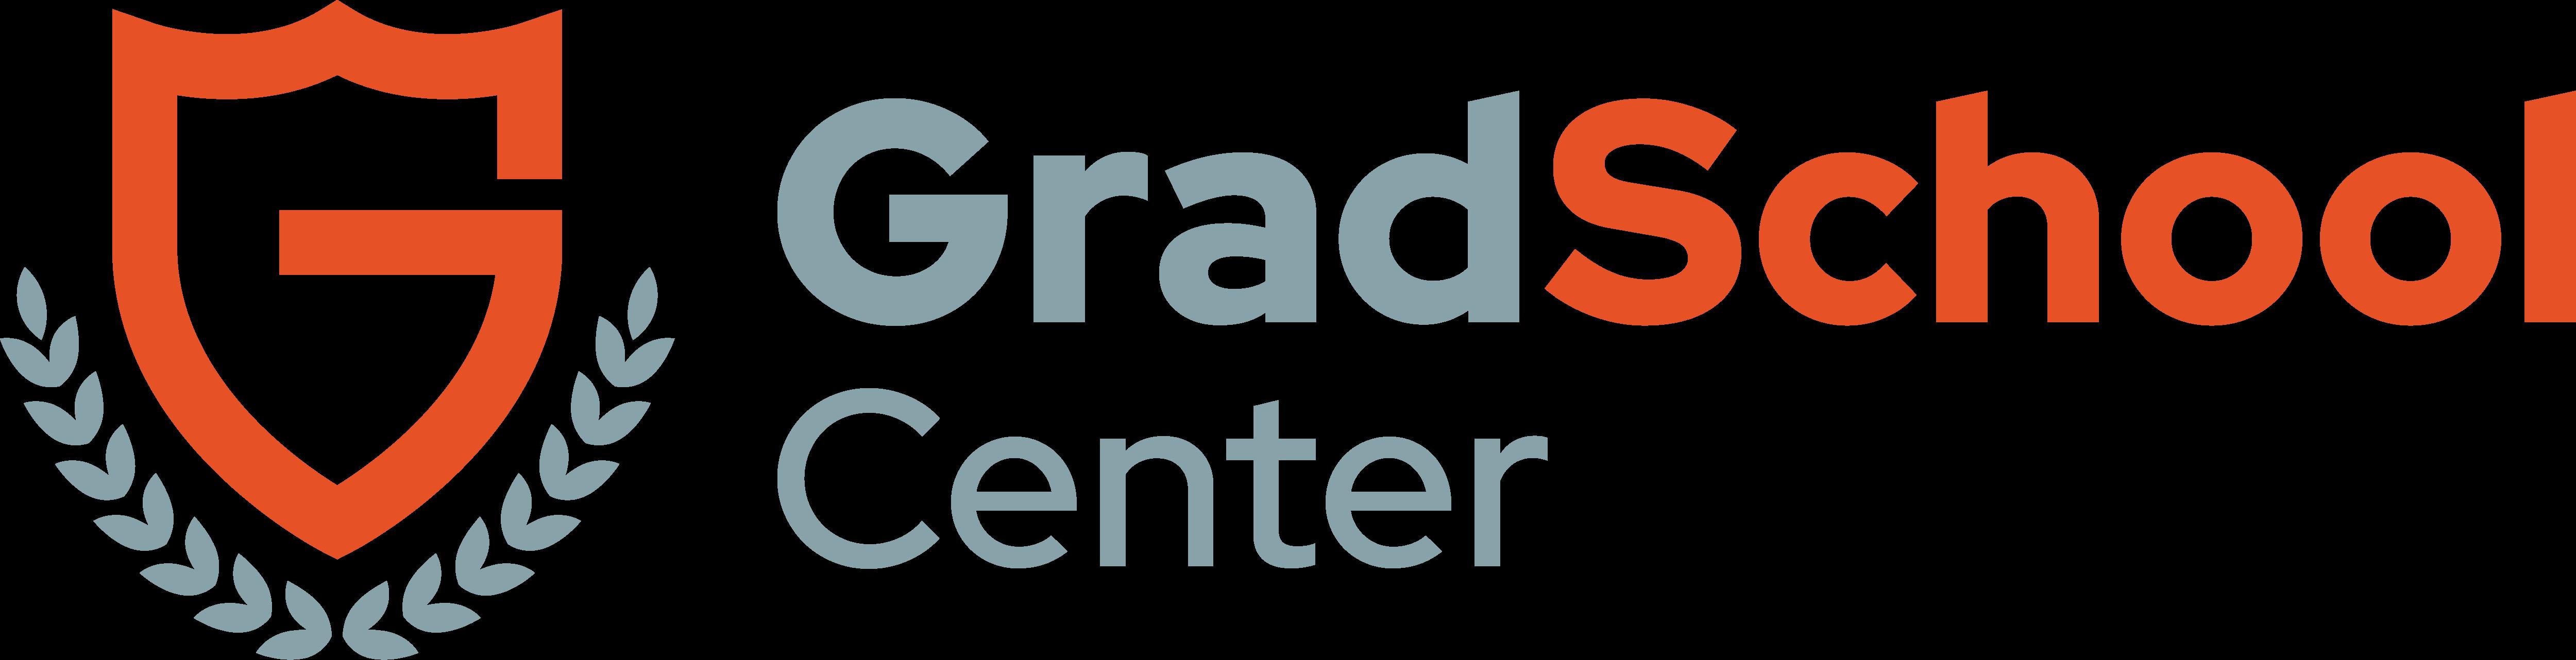 GradSchoolCenter